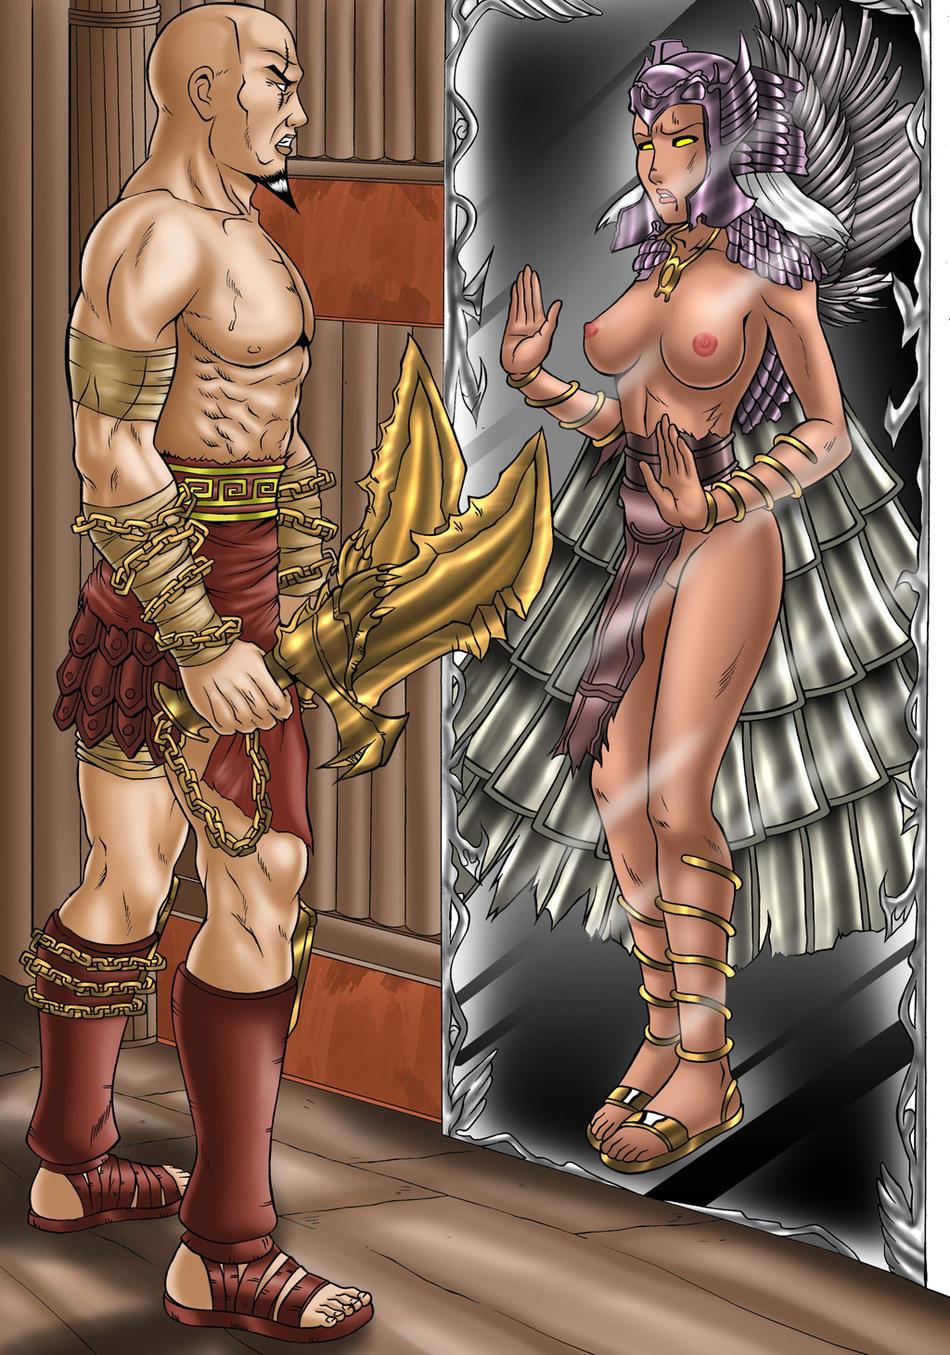 war god of pandora hentai The grim adventures of billy and mandy xxx